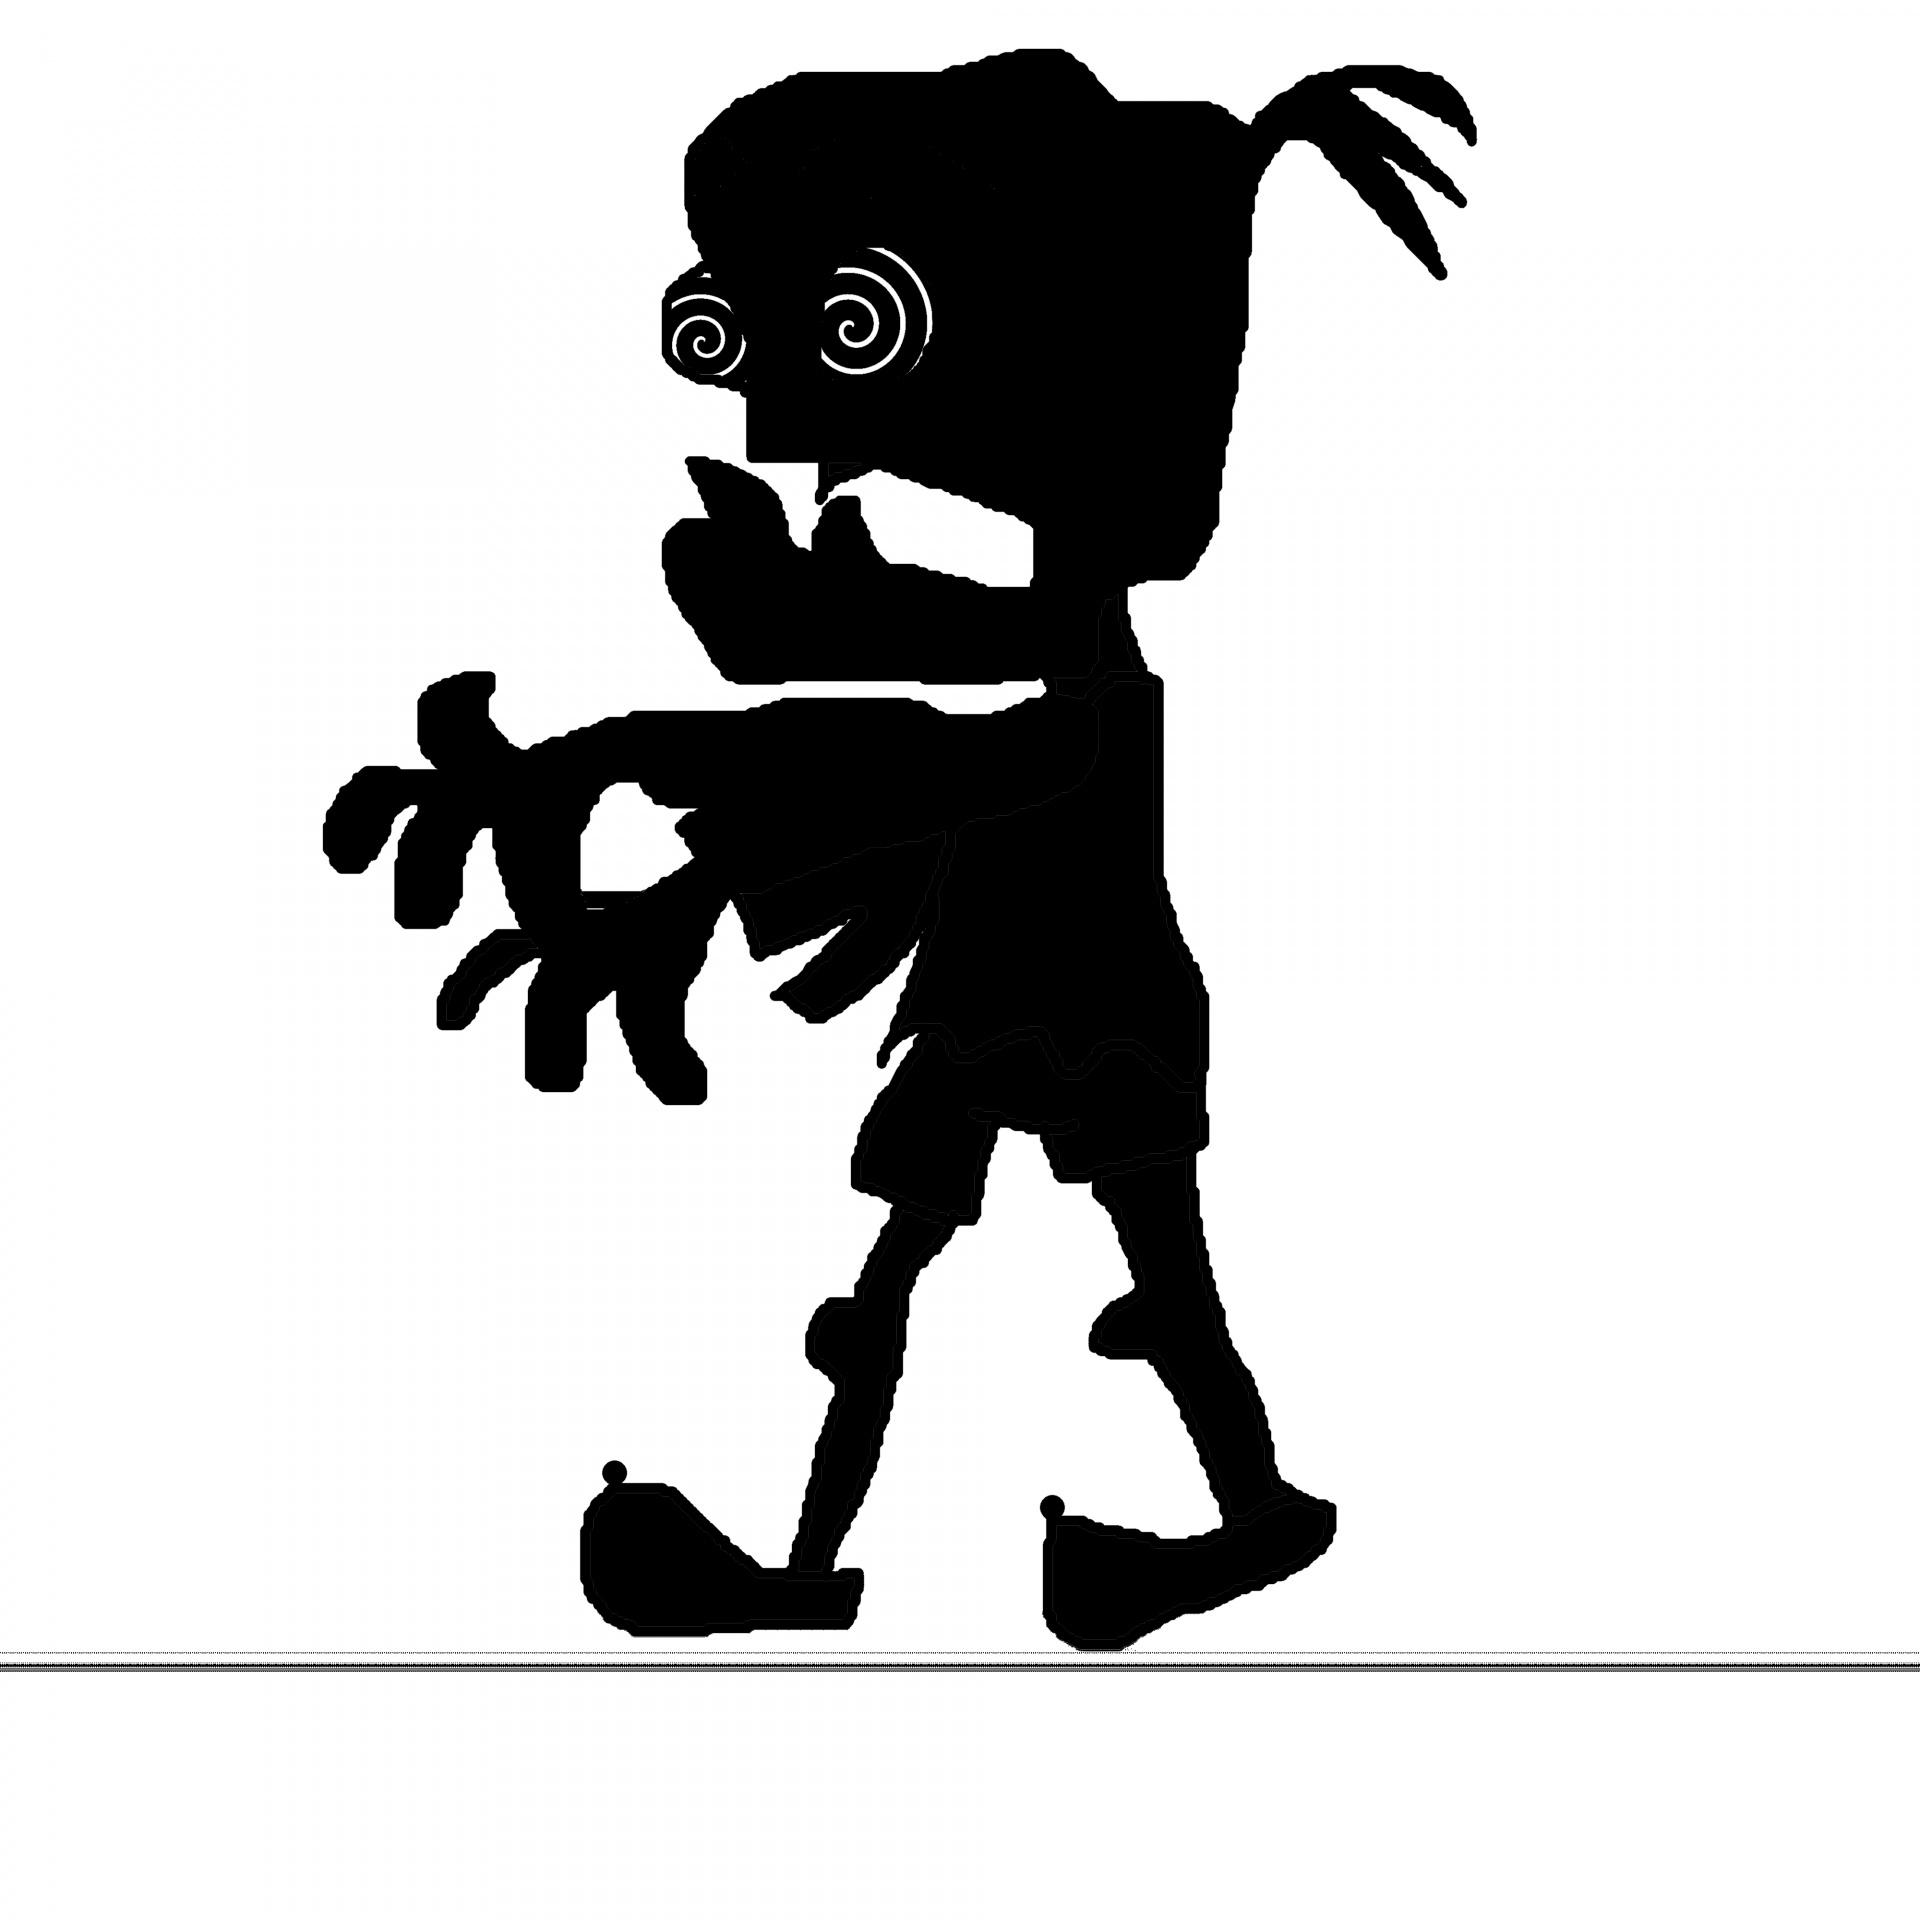 Zombie Black Silhouette White Background Free Photo From Needpix Com